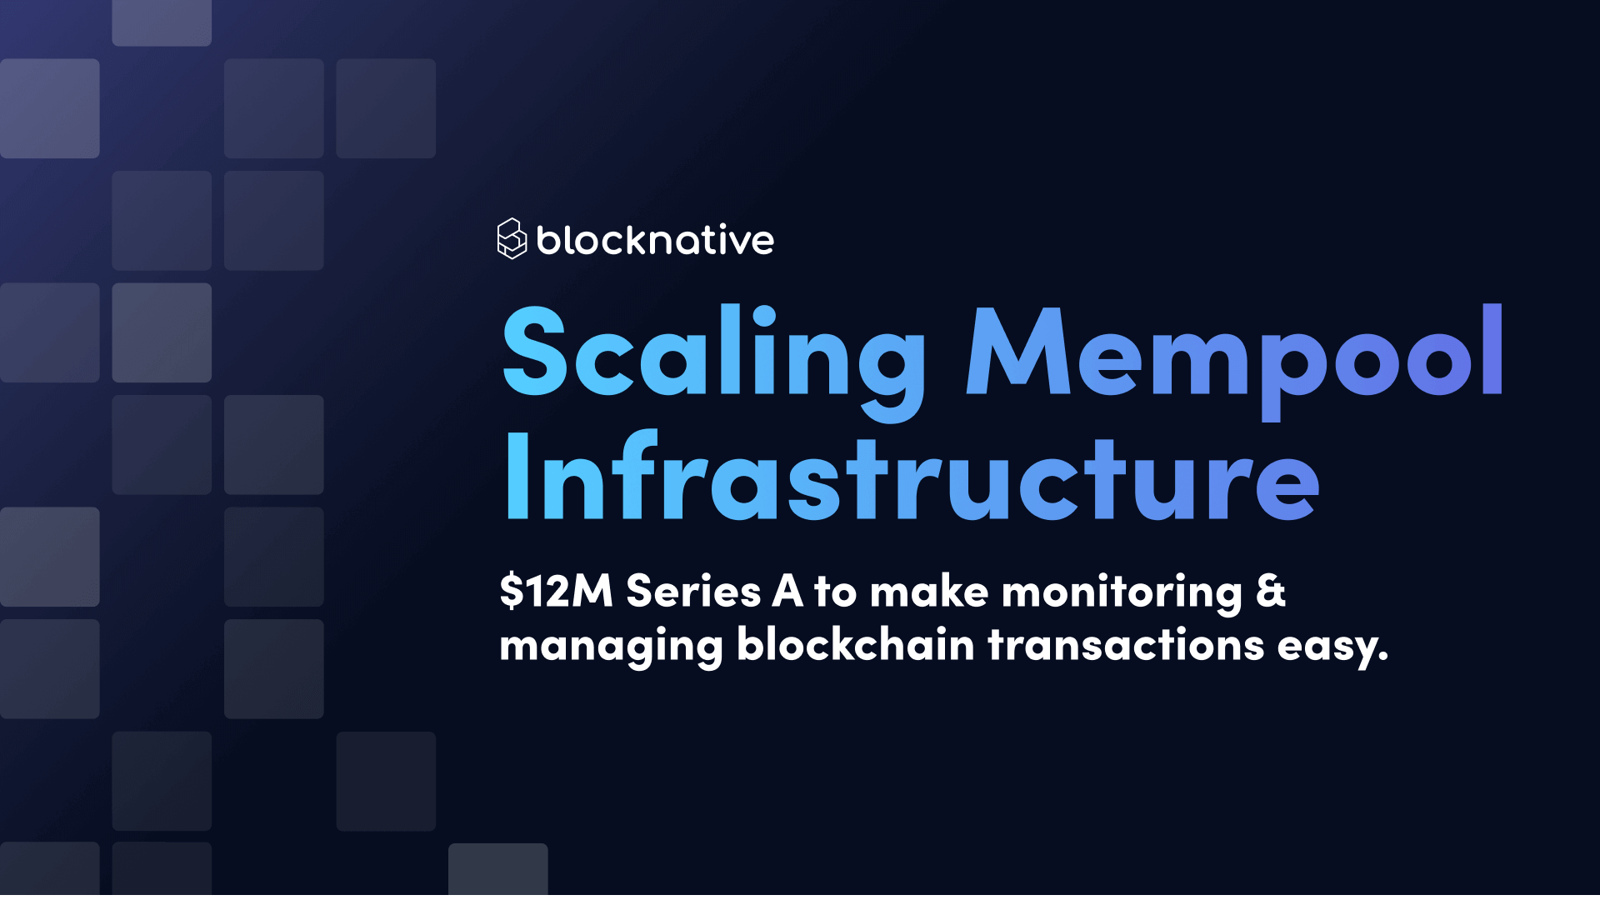 blocknative-raises-$12-million-to-scale-core-transaction-monitoring-infrastructure